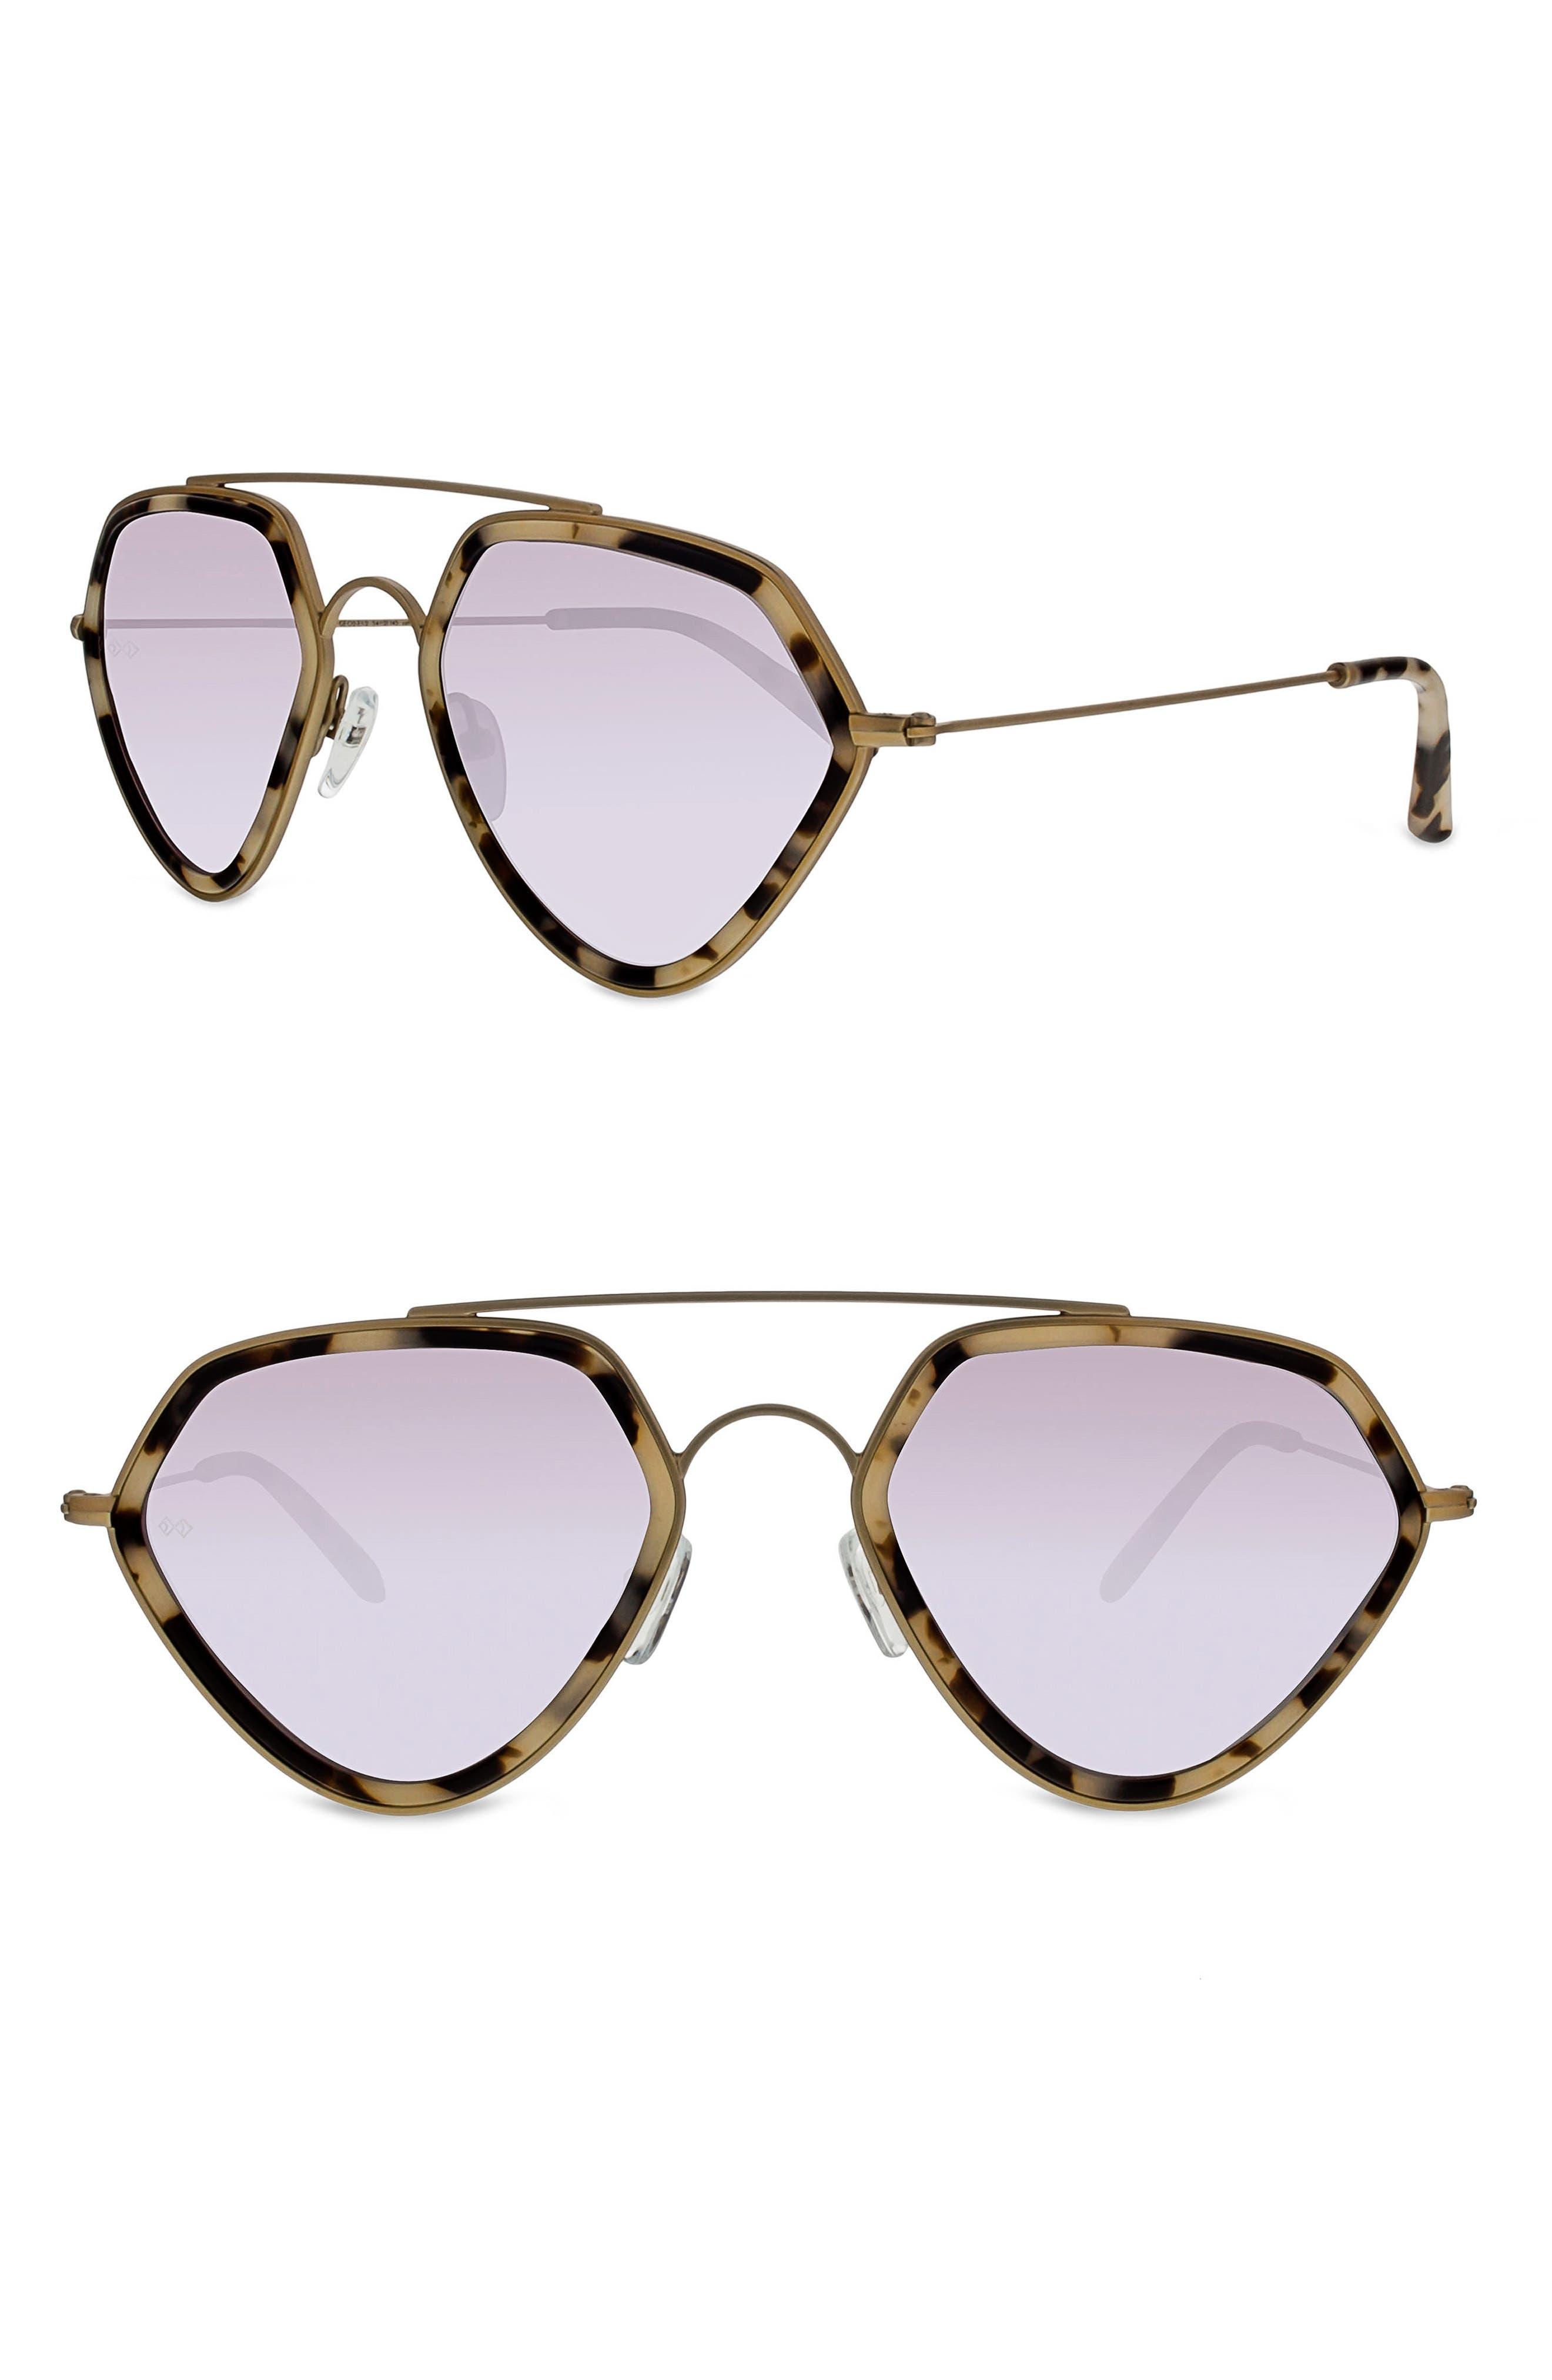 Geo II 54mm Sunglasses,                             Main thumbnail 1, color,                             MATTE GOLD/ SILVER MIRROR